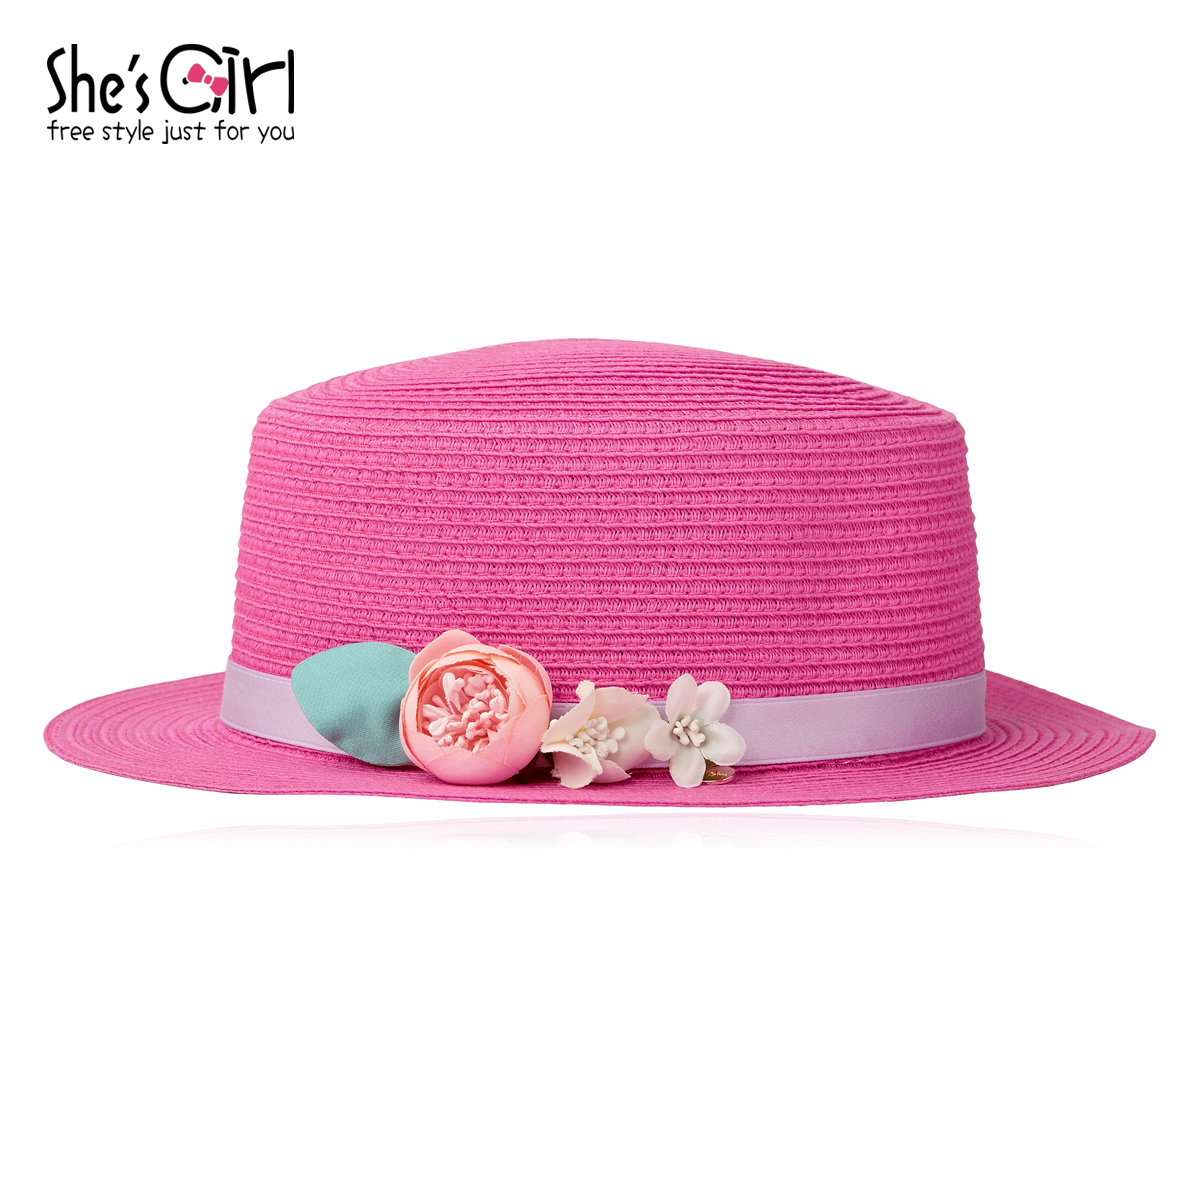 She's Girl茜子配饰 糖果色甜美花朵草编织帽子宽檐小檐遮阳帽子